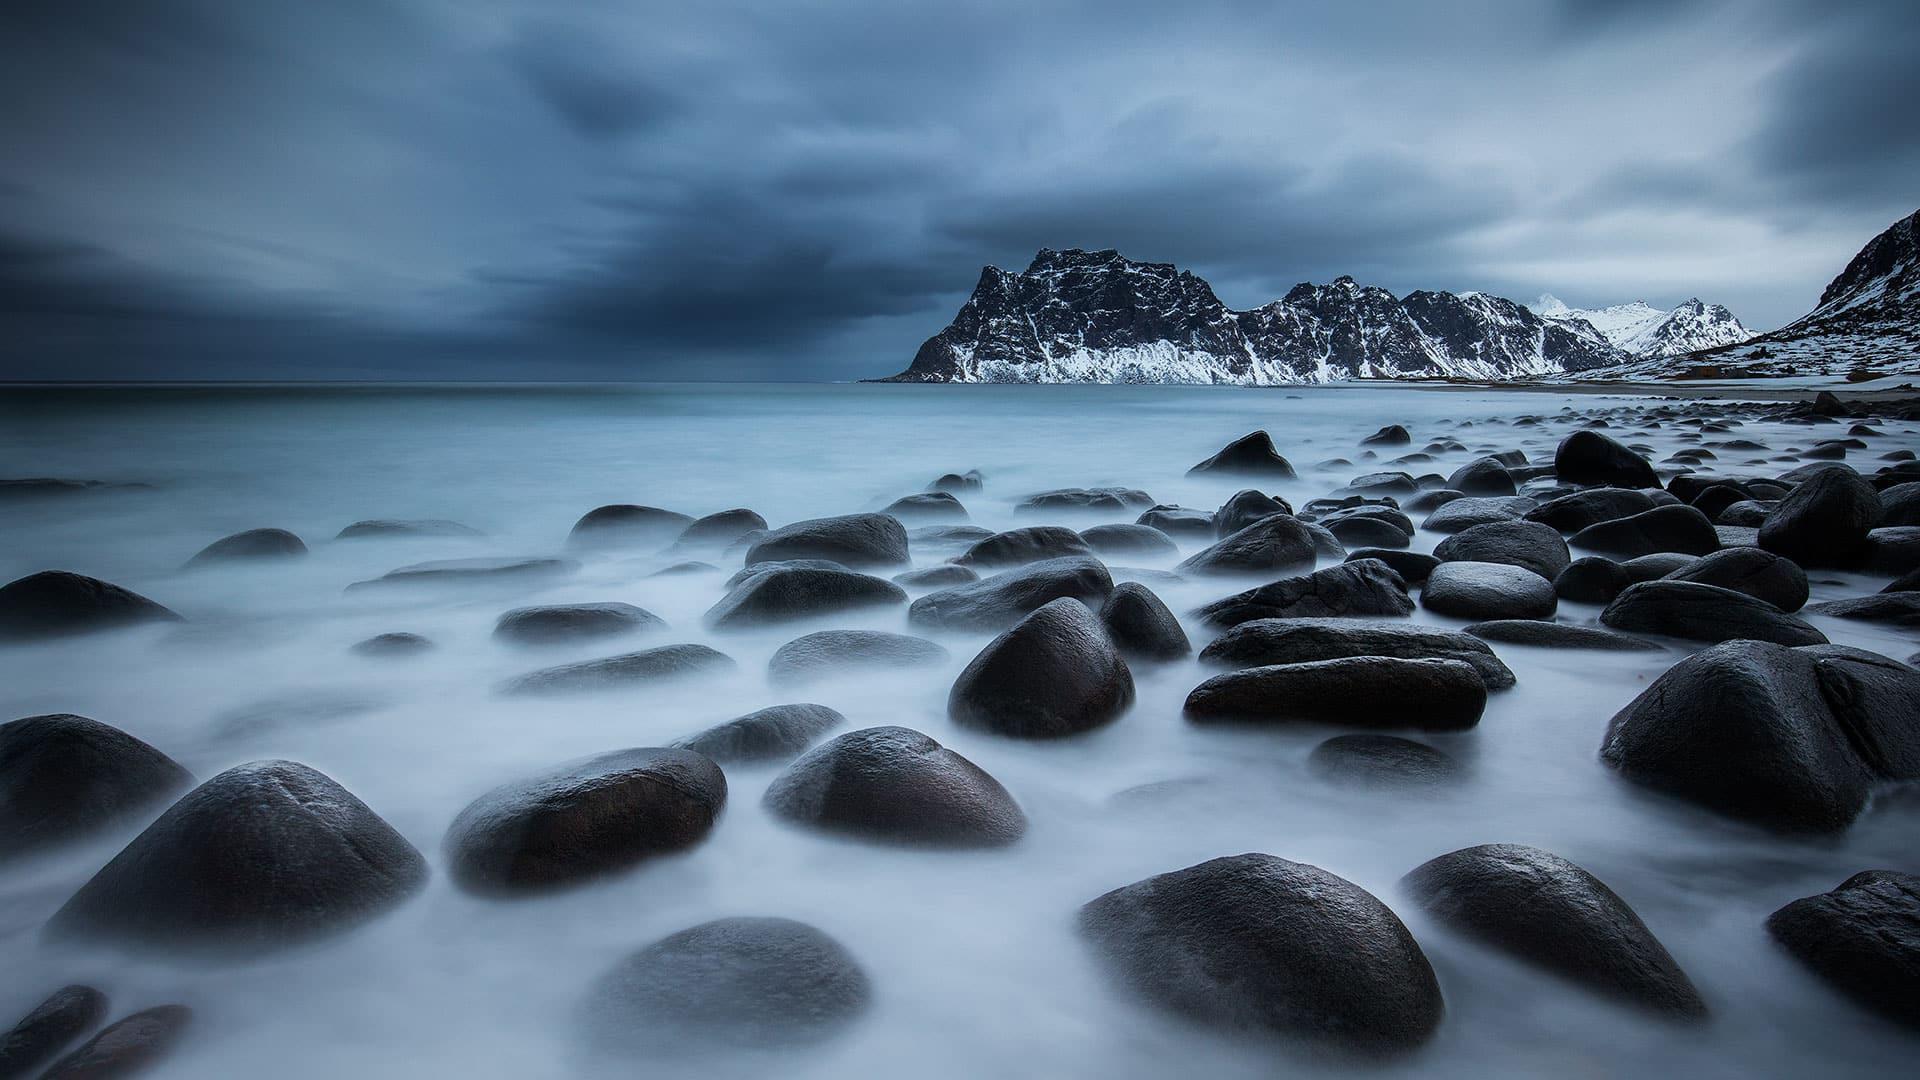 Lofoten Copyright © benoit malaussena 2016 . All rights reserved.